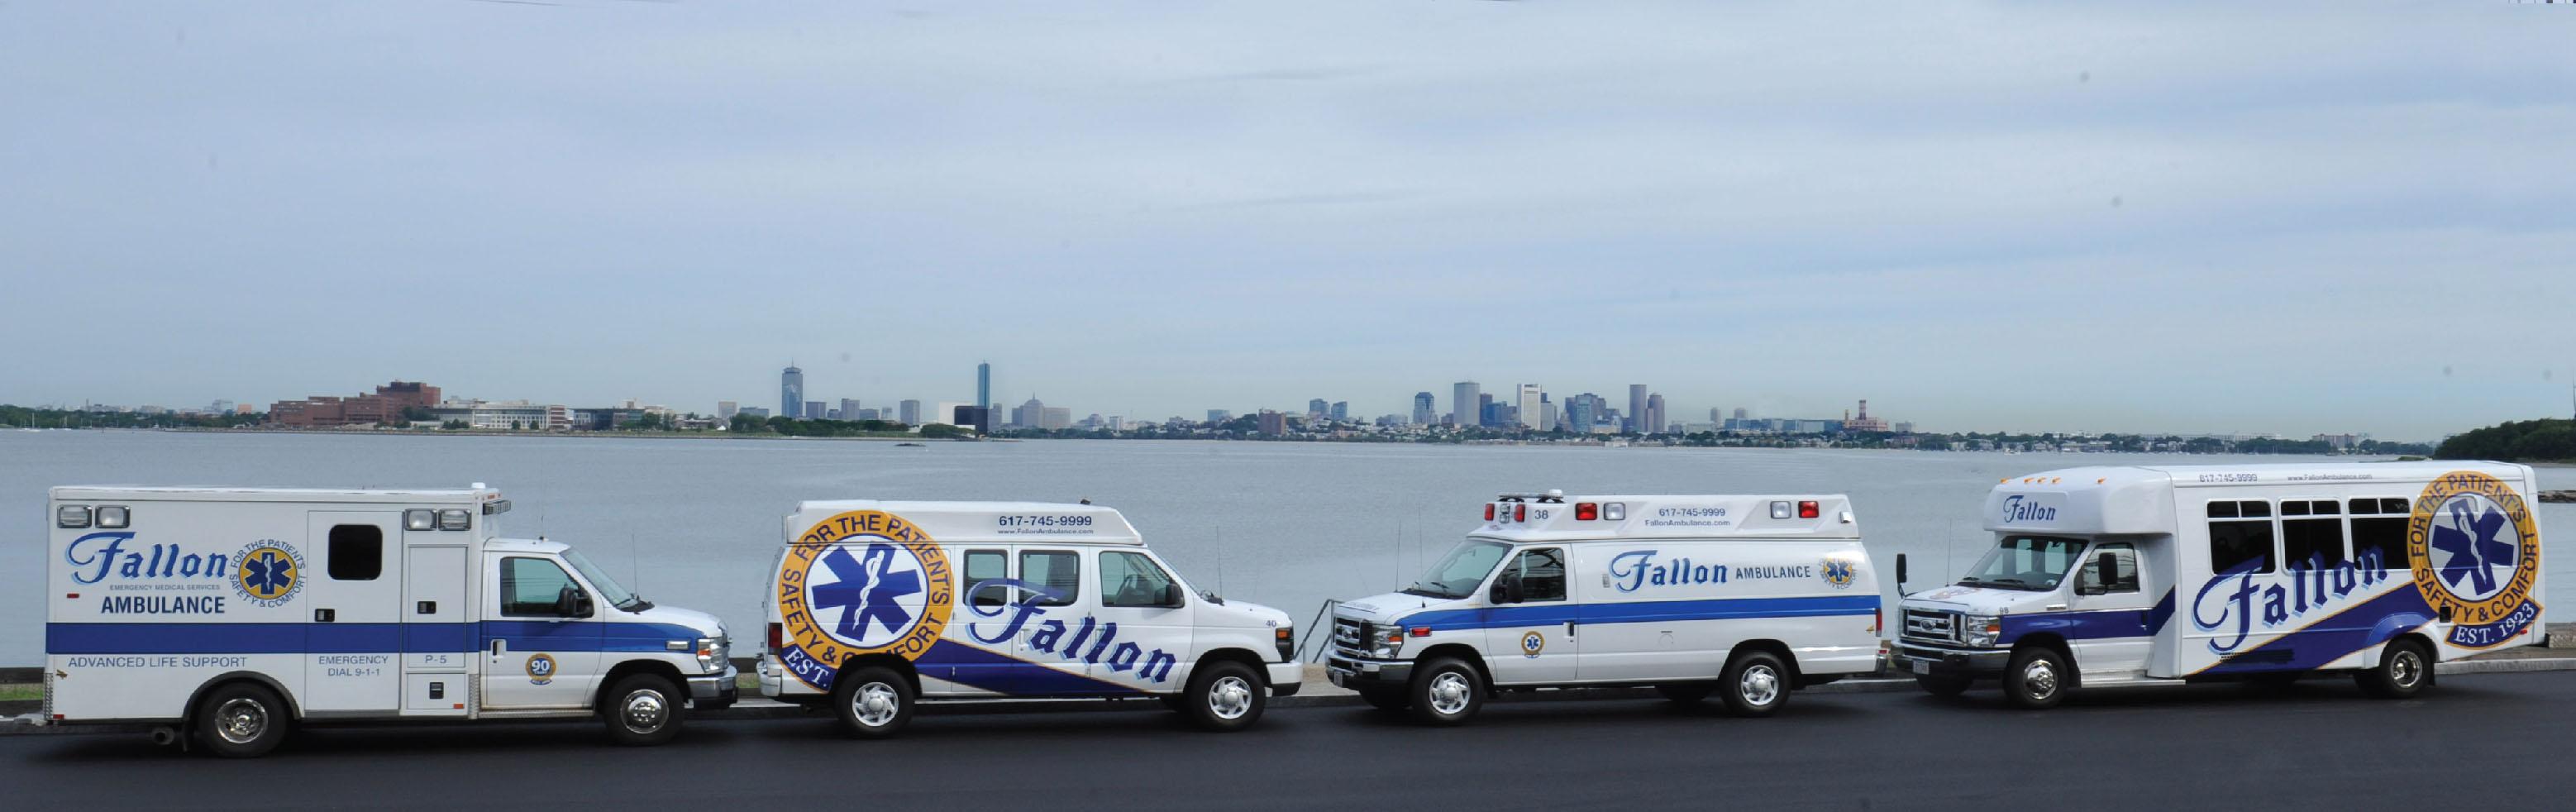 home fallon ambulance service